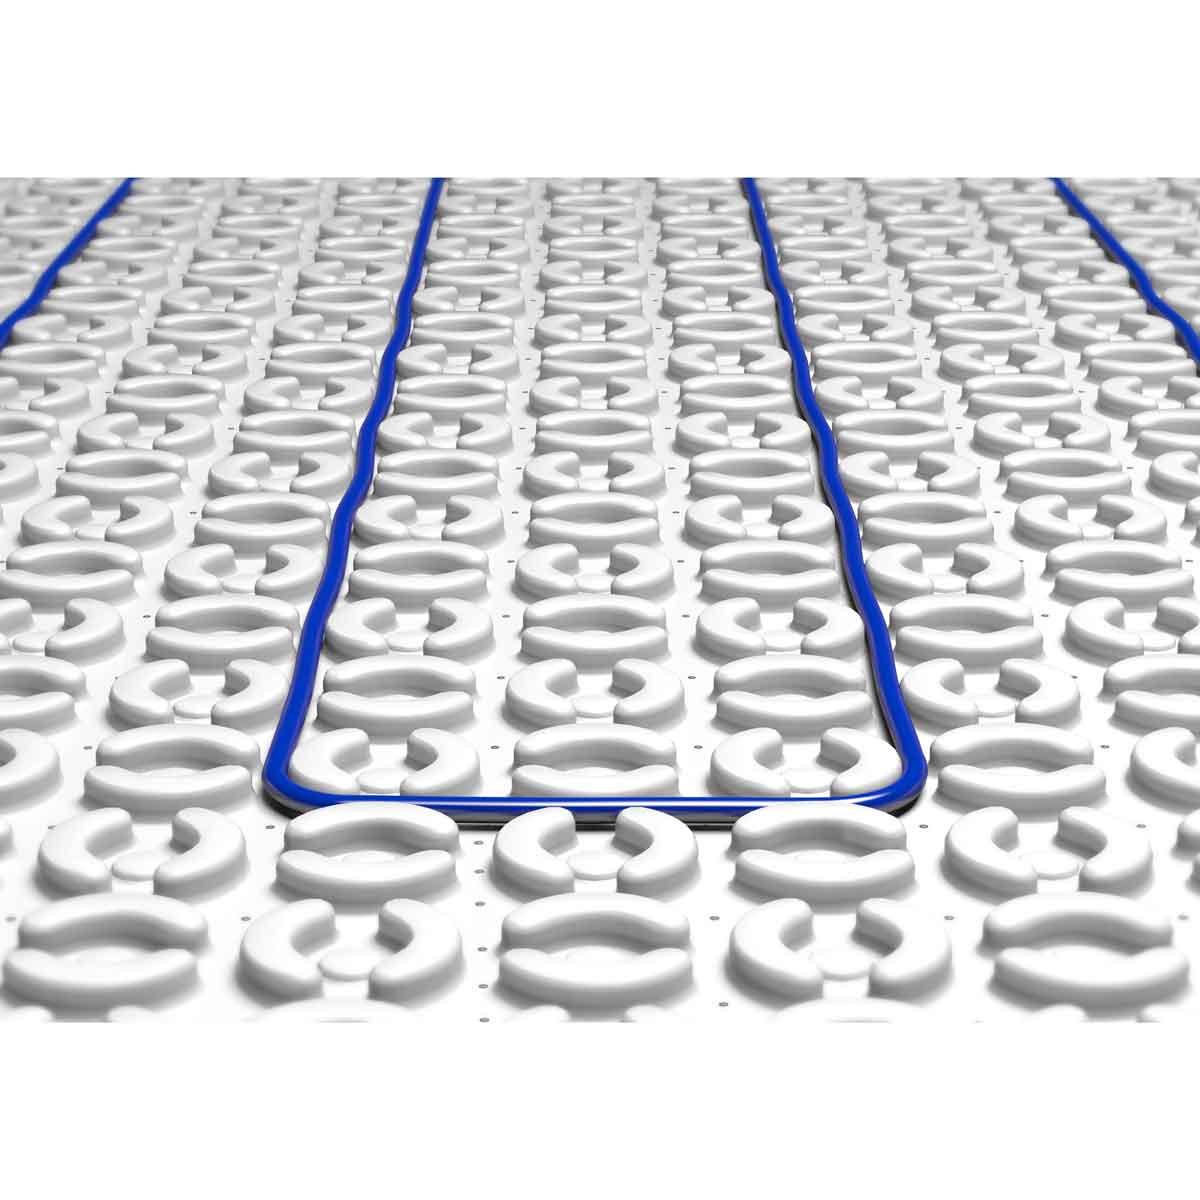 Laticrete Radiant Floor Heating